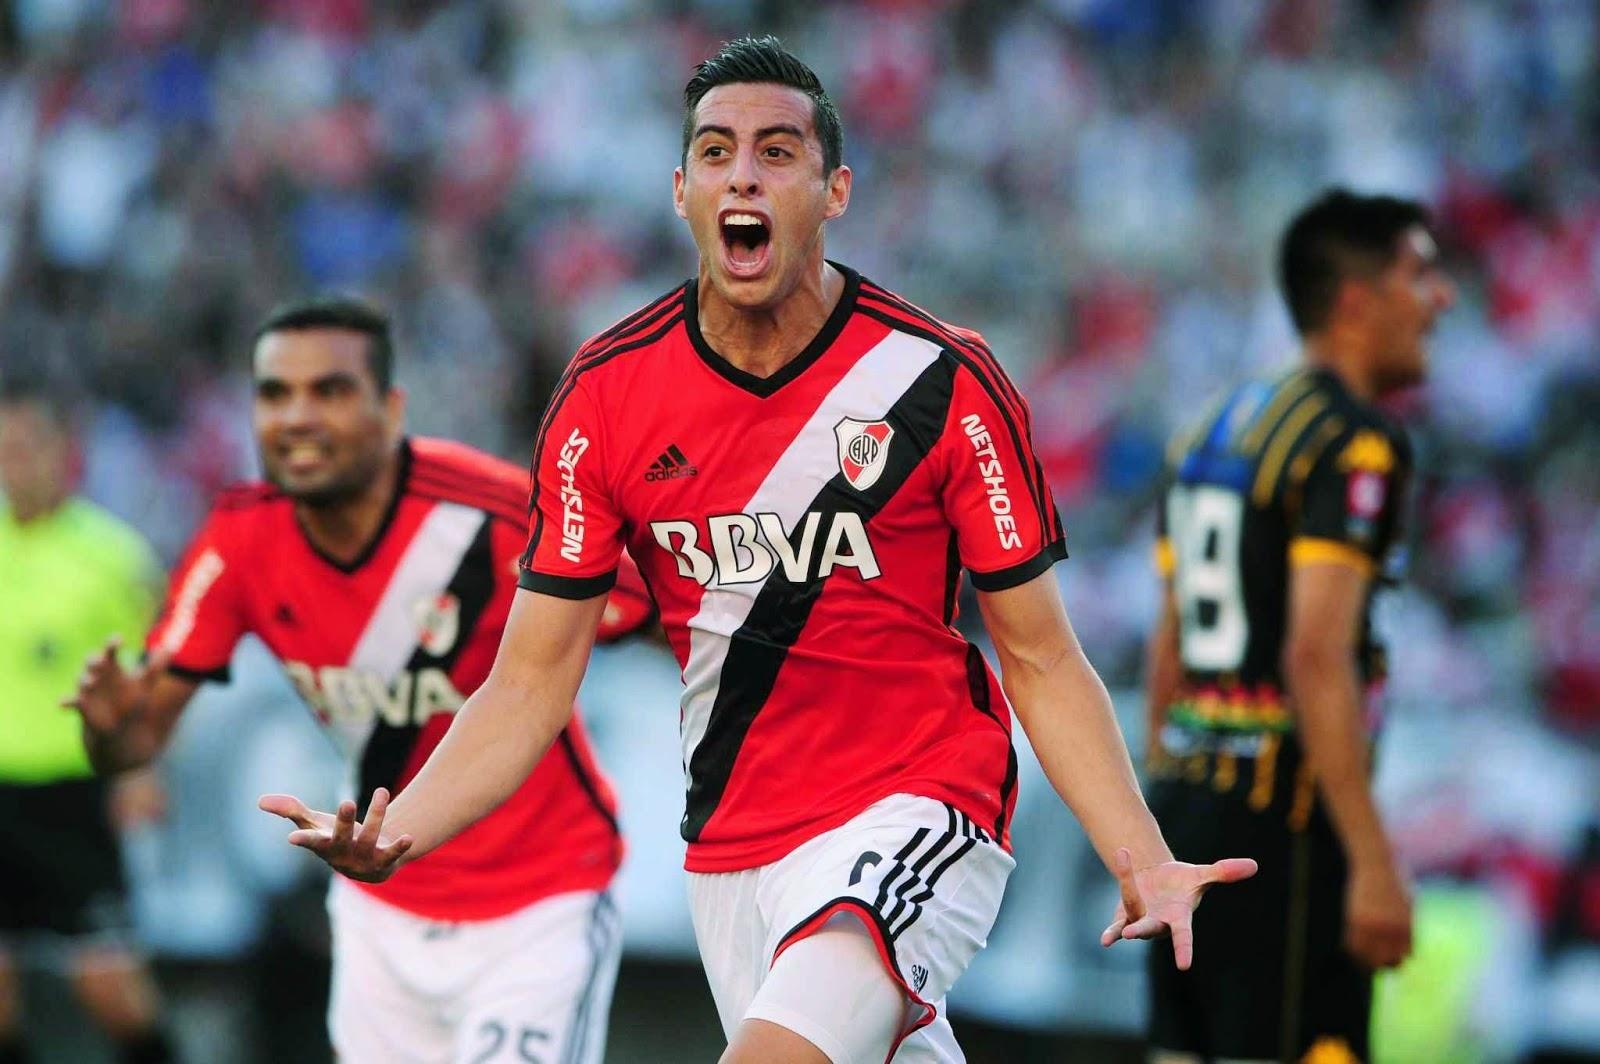 Gol, Funes Mori, Mellizo, River, River Plate, Olimpo, Empate, Torneo Transición, Boca, camiseta nueva, adidas, alternativa, suplente,